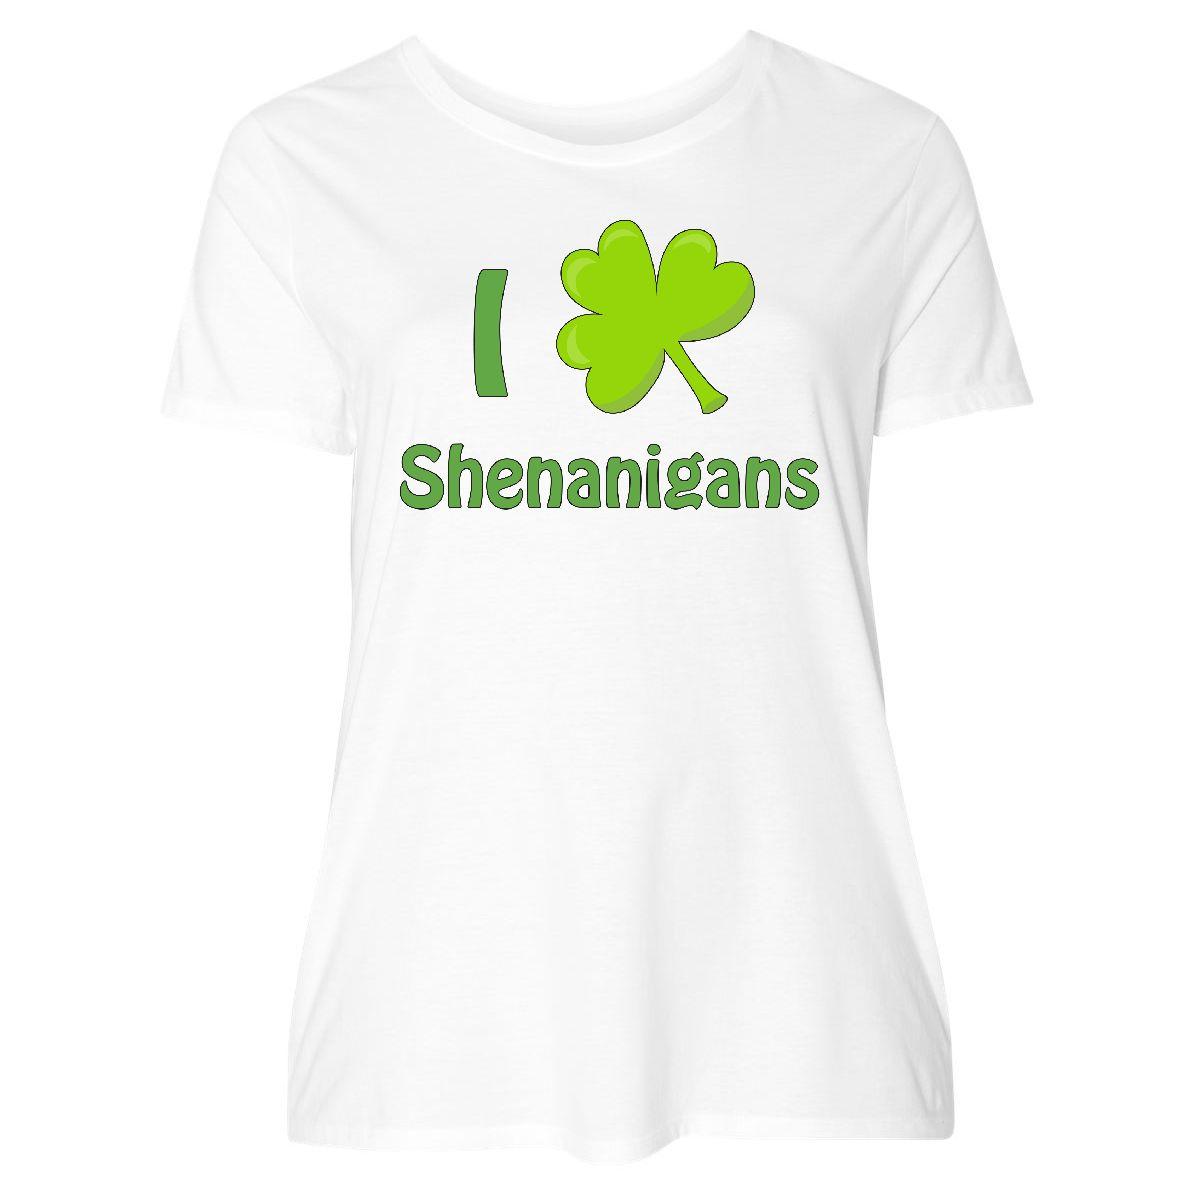 82ce60f8b97 Details about Inktastic I Heart Shenanigans Women s Plus Size T-Shirt Saint  Patricks Day Love